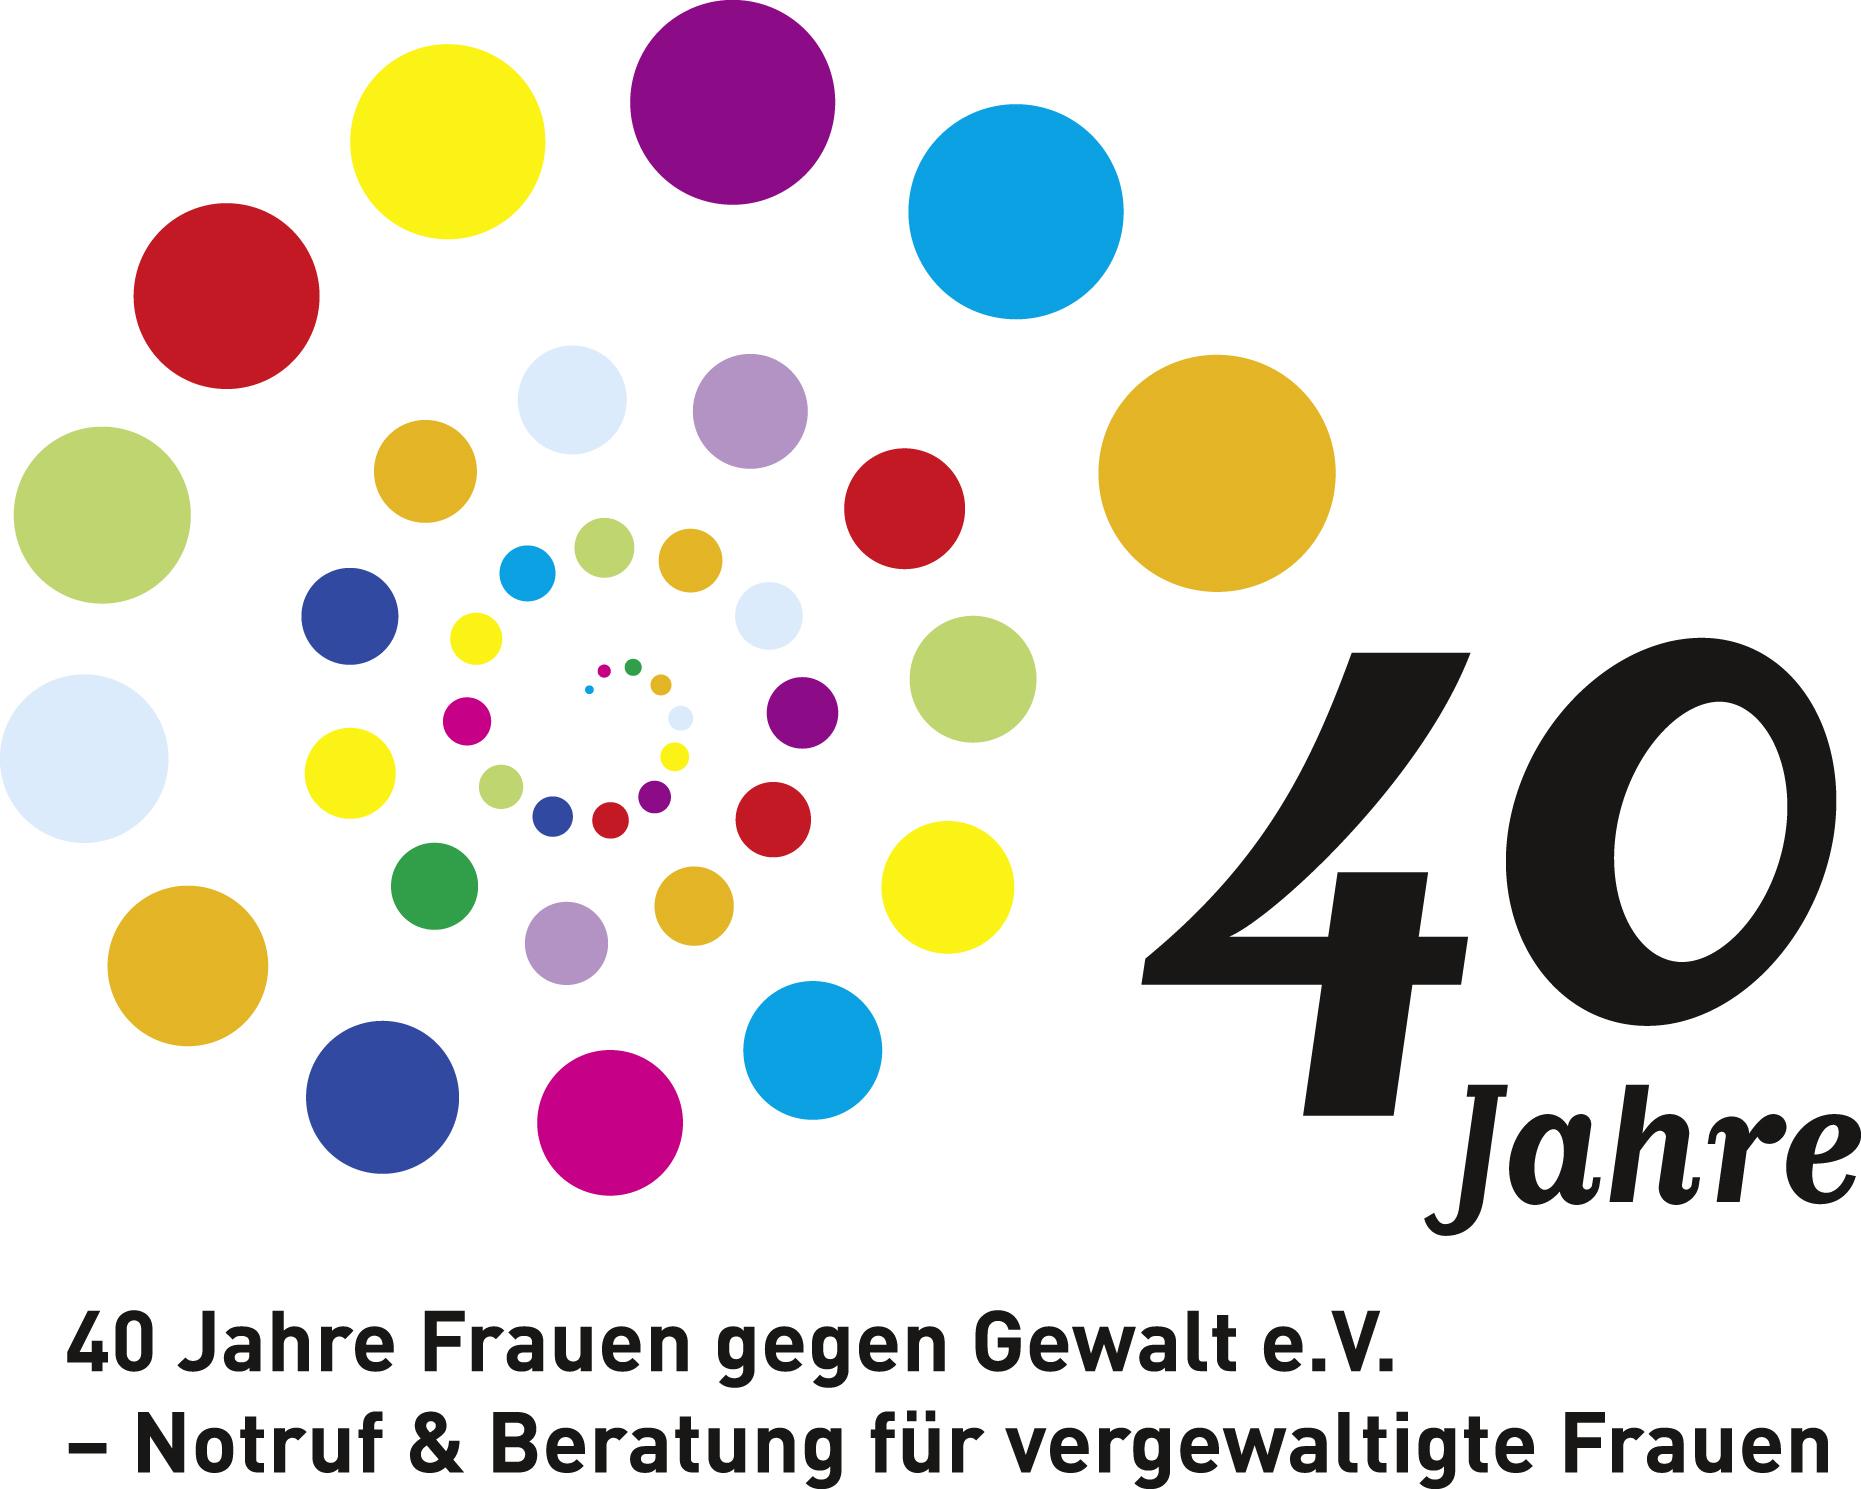 40 Jahre Frauen gegen Gewalt e.V. Köln